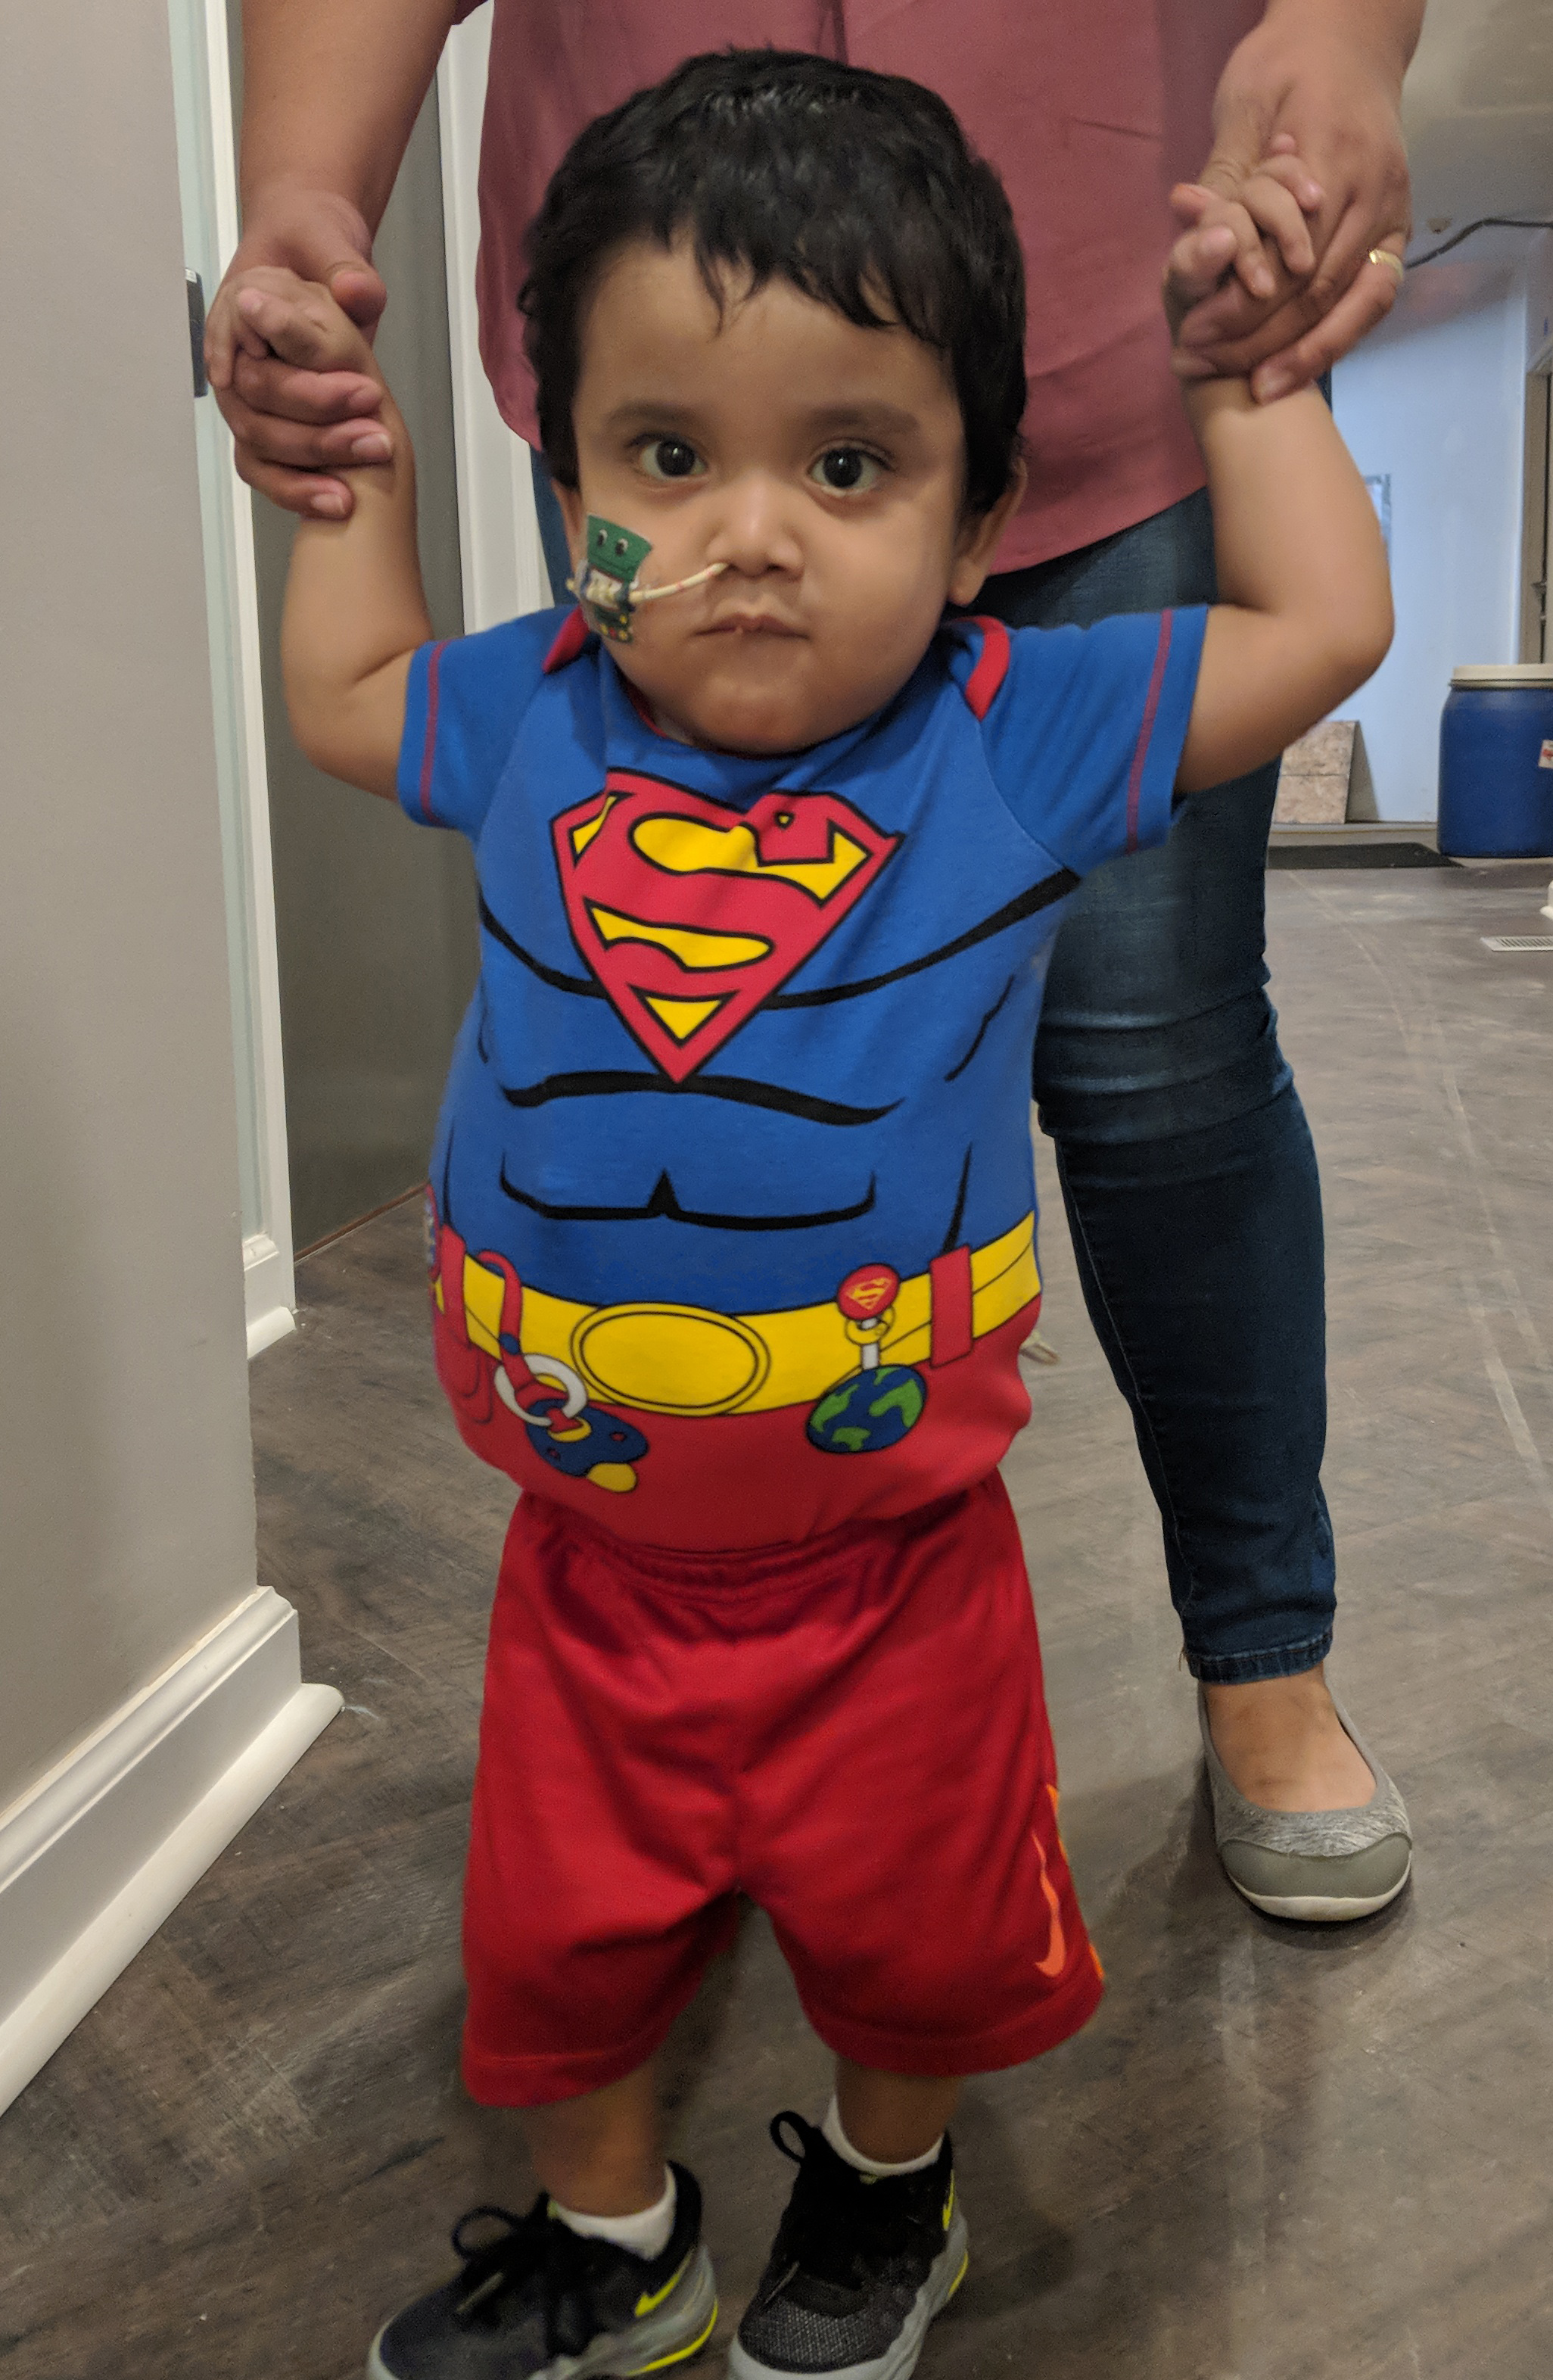 Ariel wearing a Superman shirt